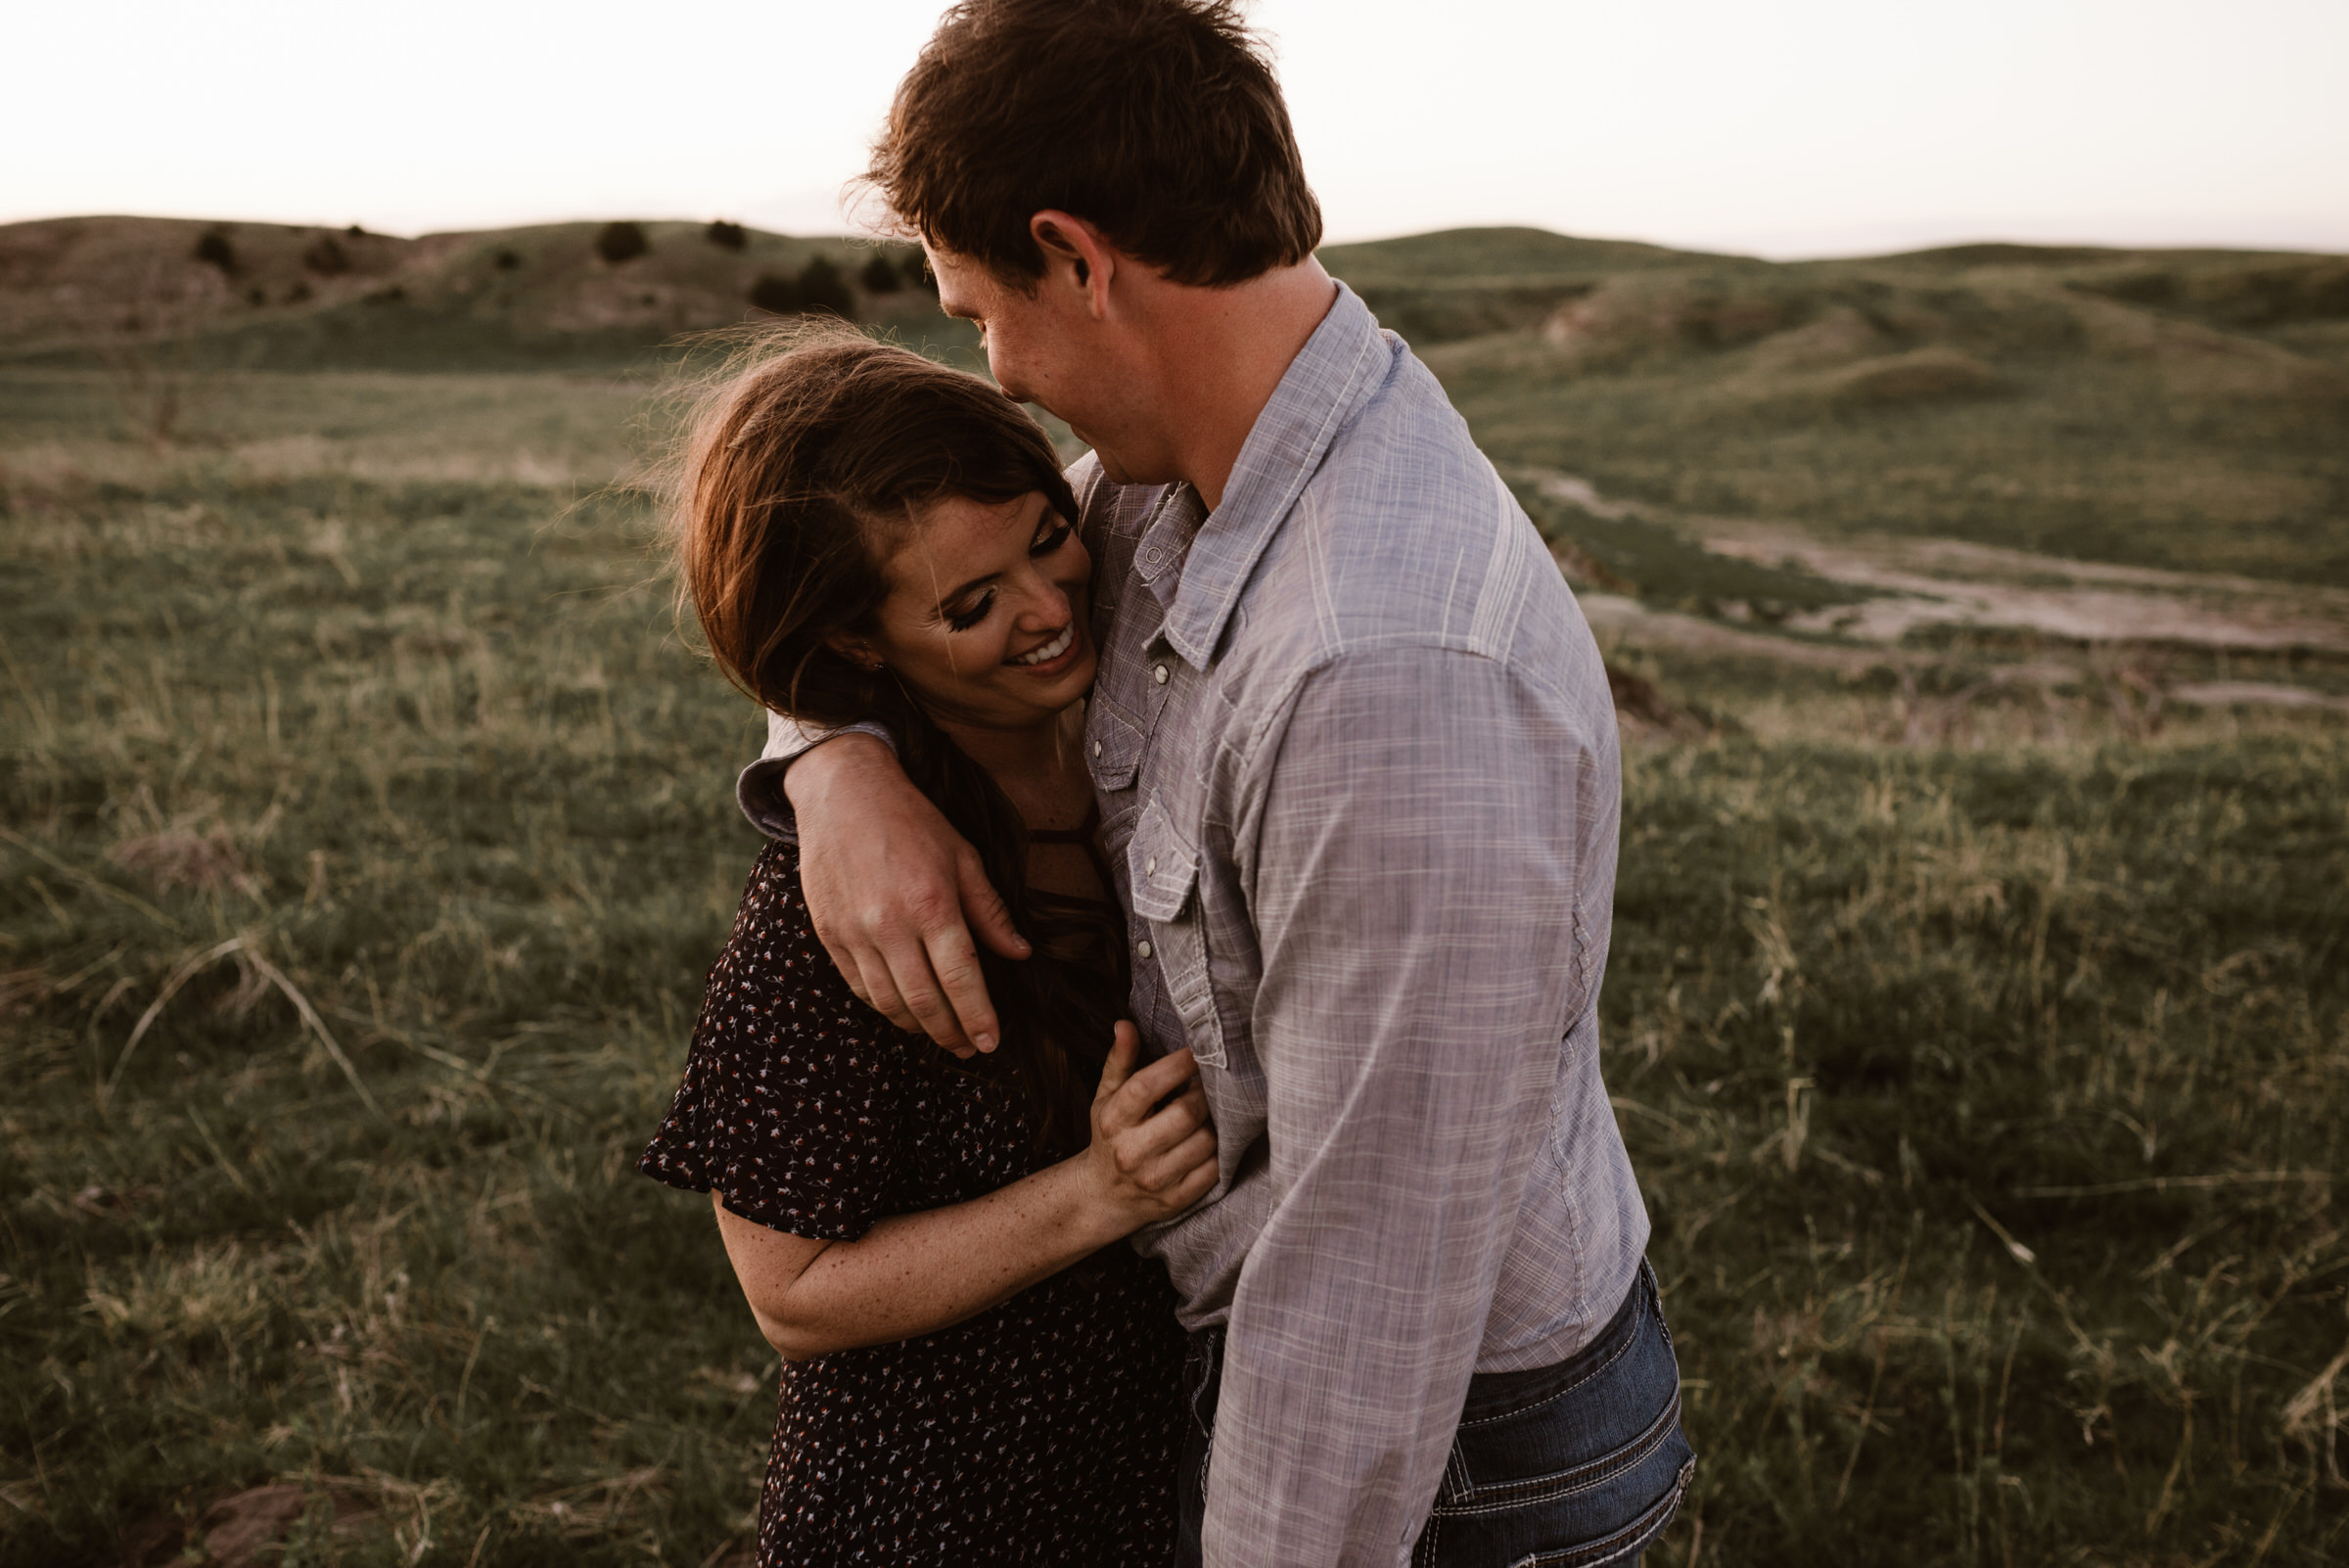 Sandhills-Nebraska-Engagement-Wedding-Photographer-Kaylie-Sirek-Photography-040.jpg